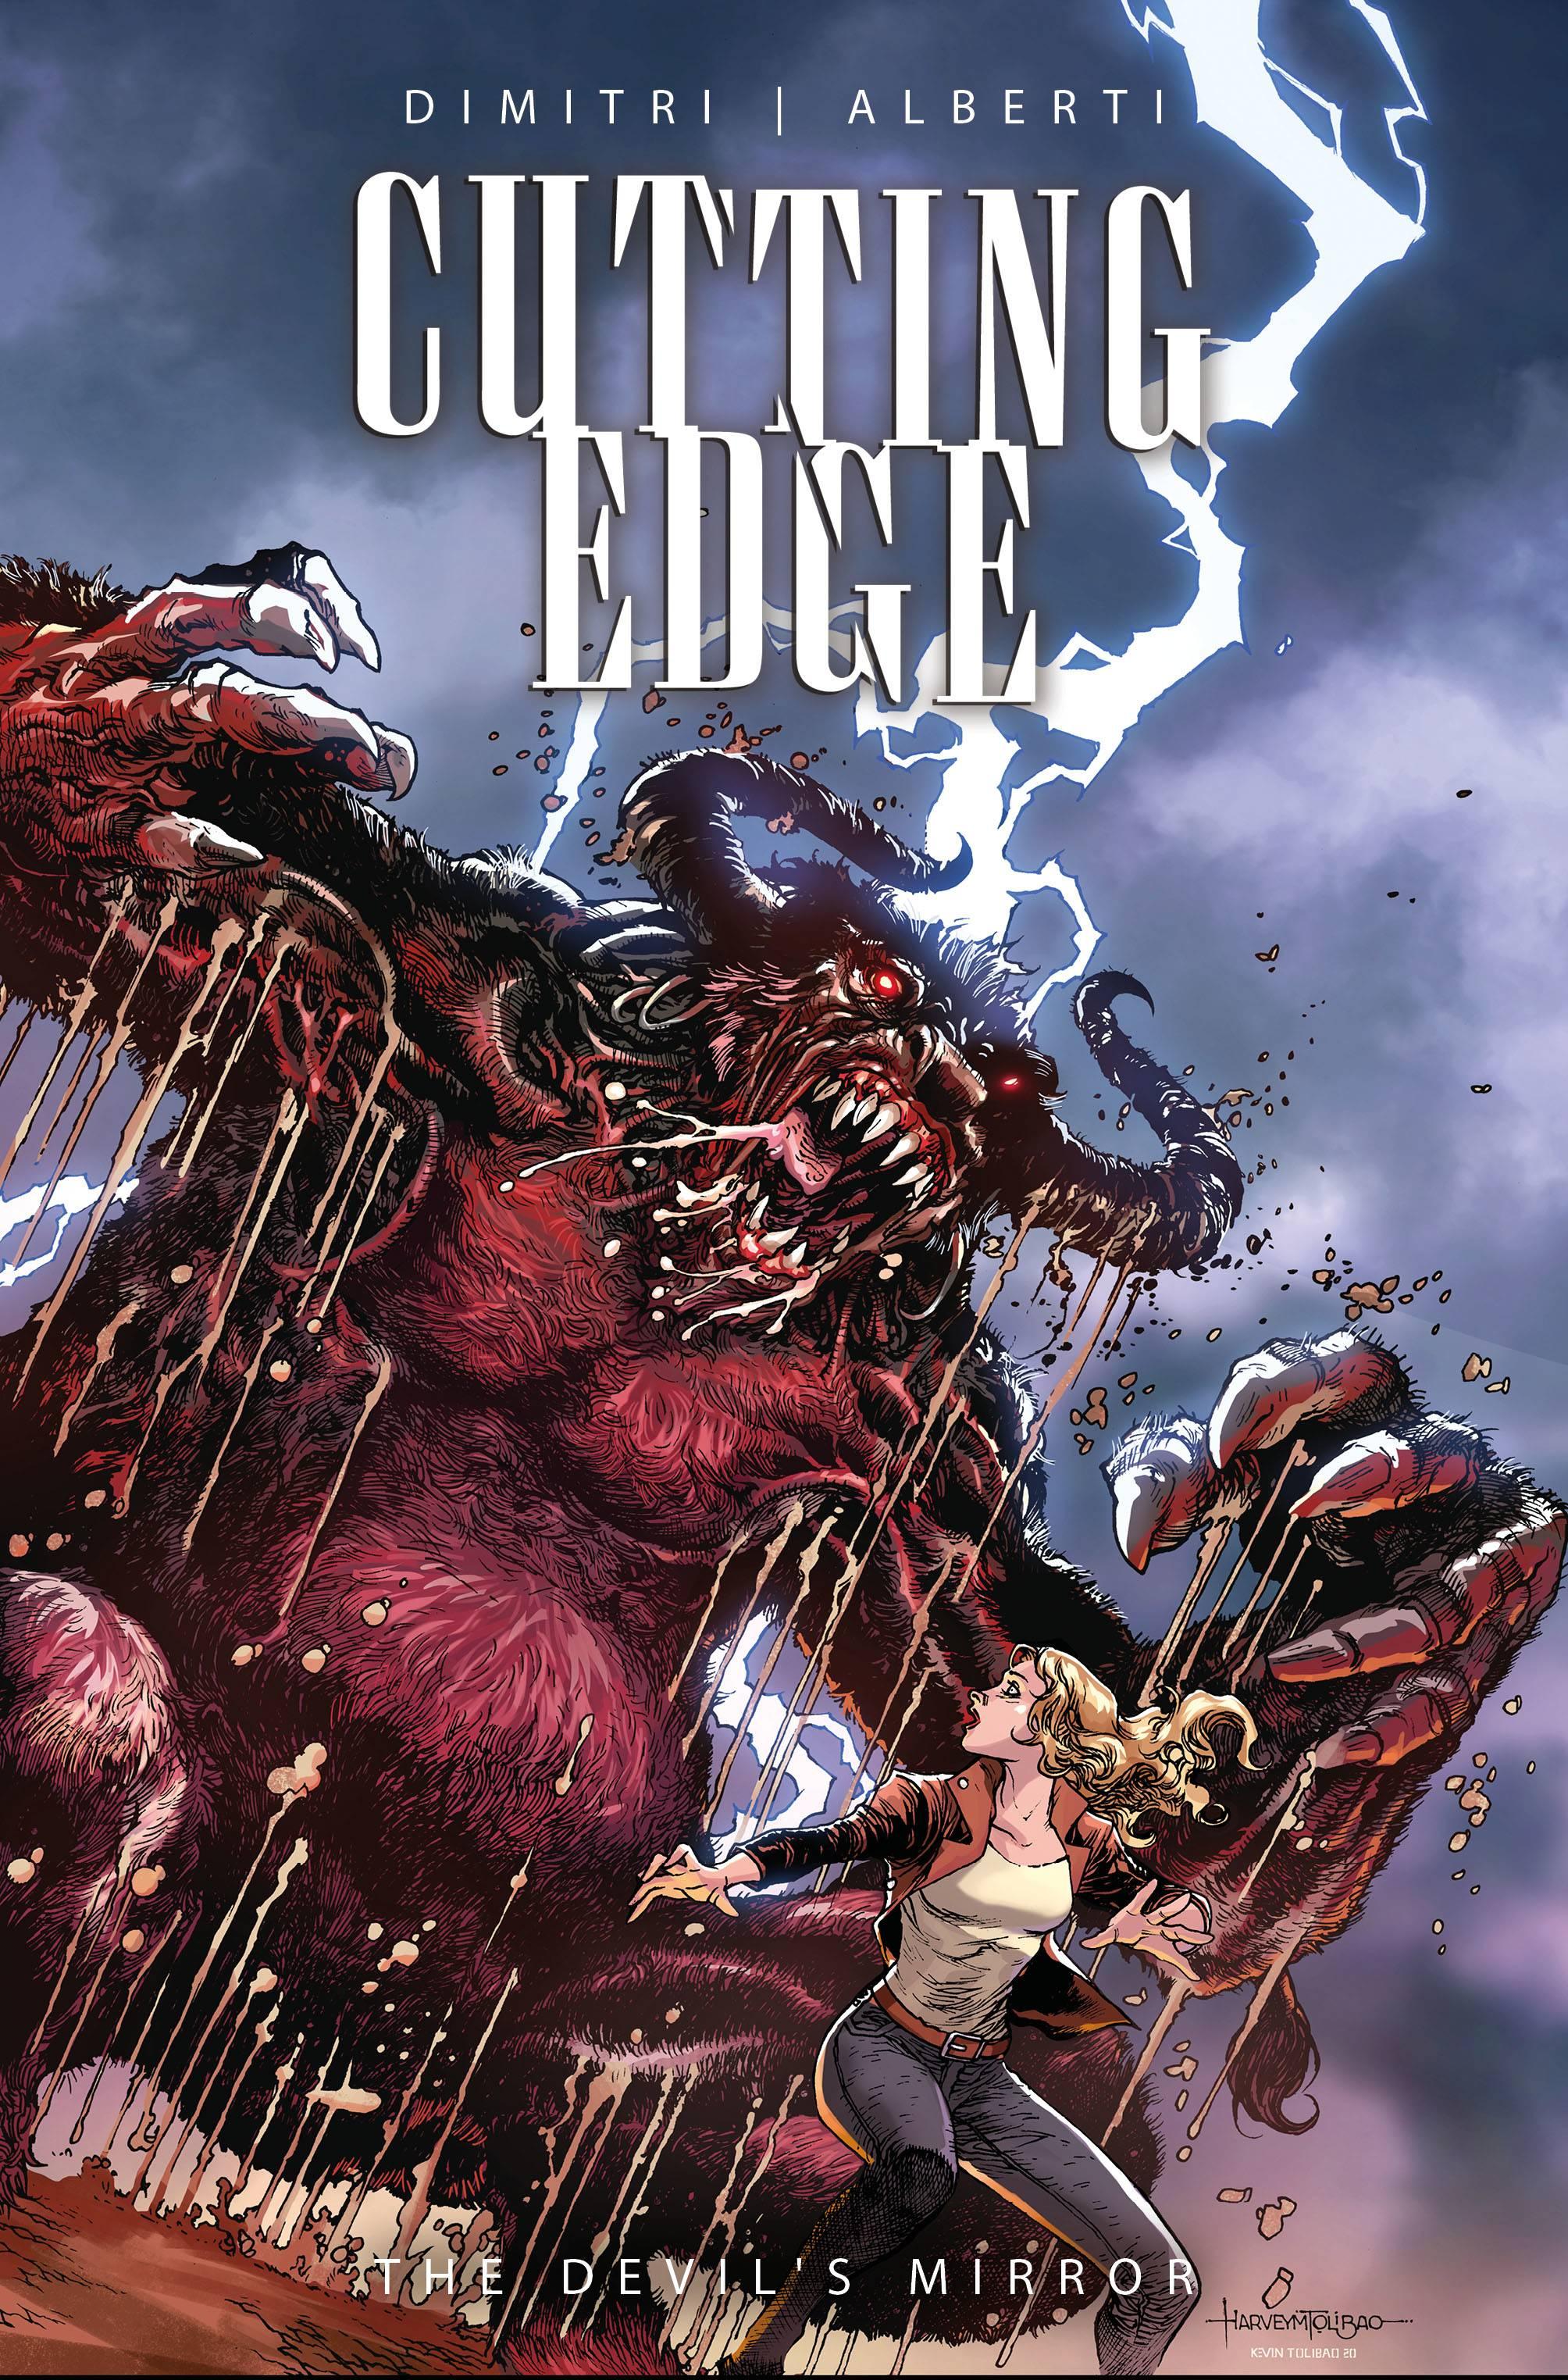 CUTTING EDGE DEVILS MIRROR